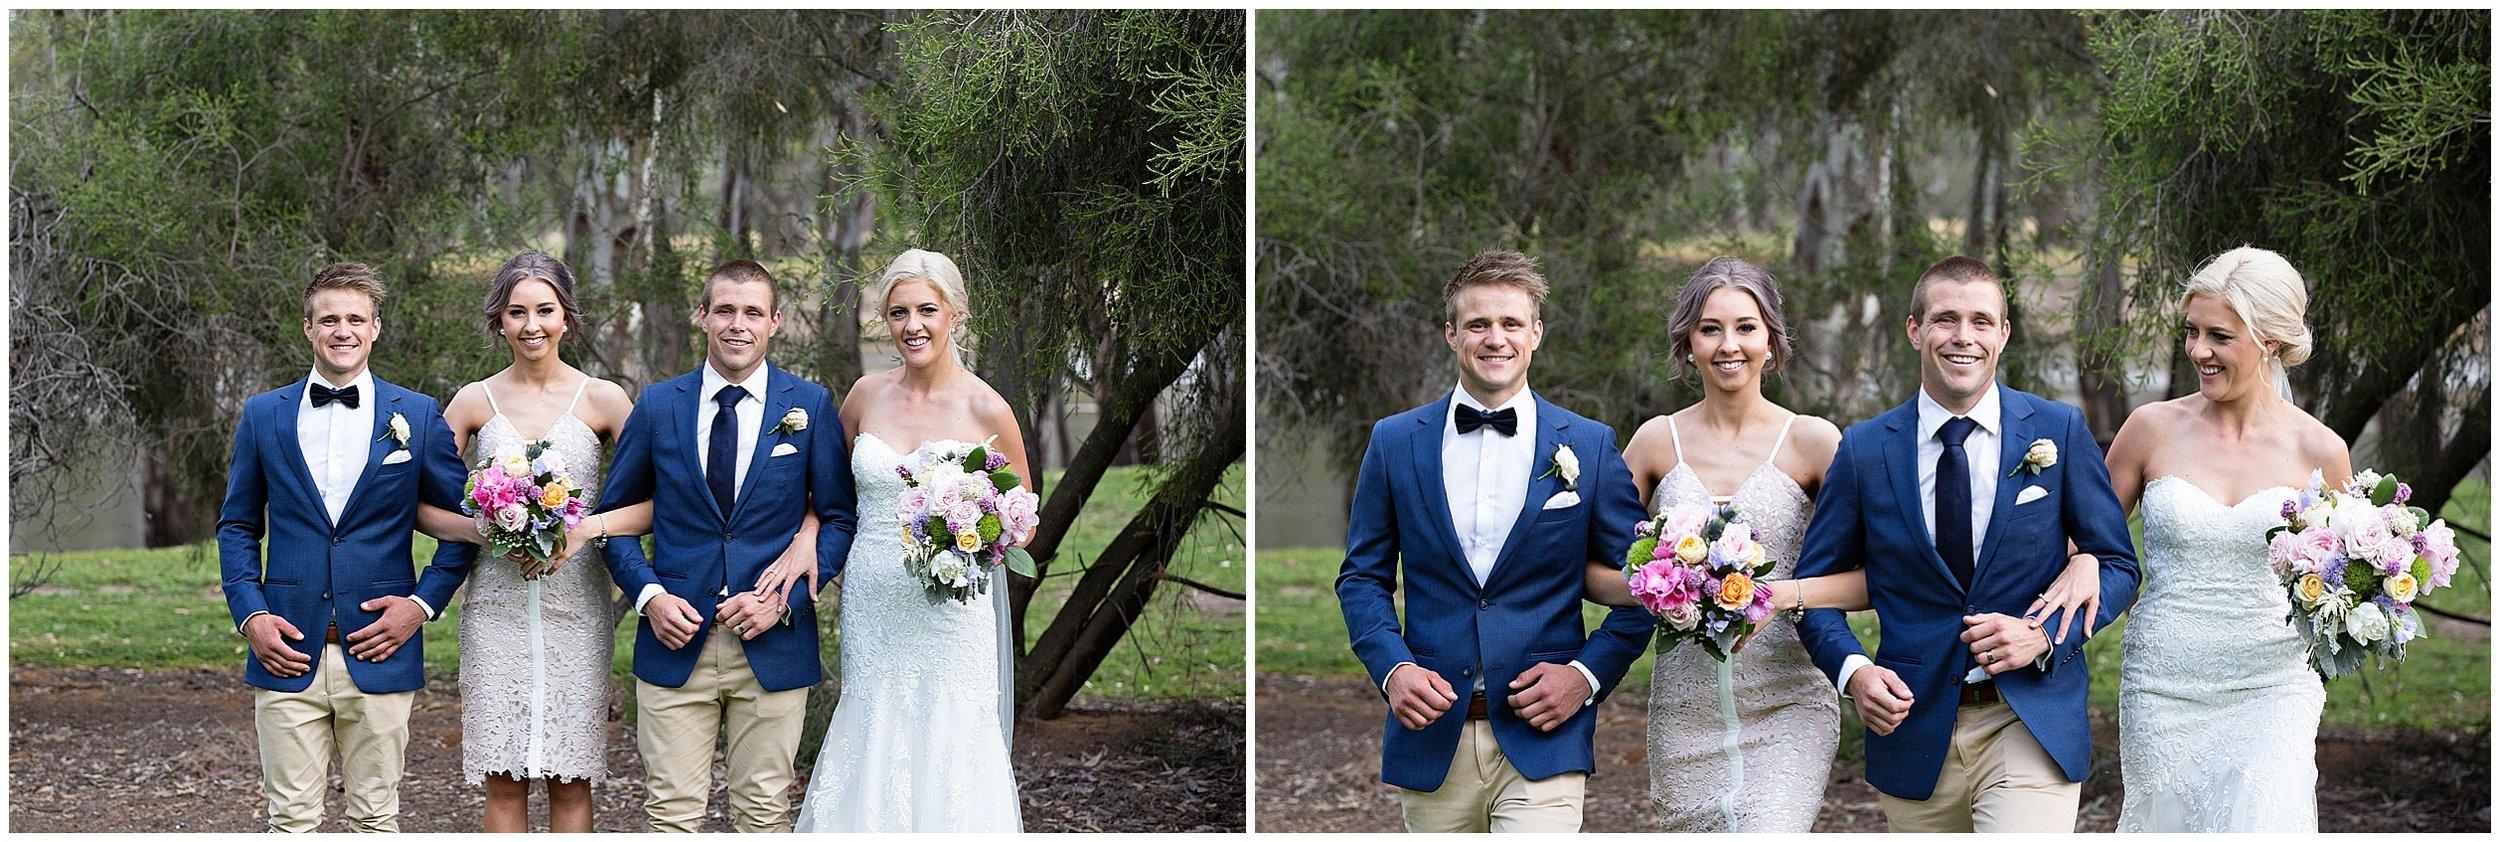 shepparton-wedding-photographer_0130.jpg